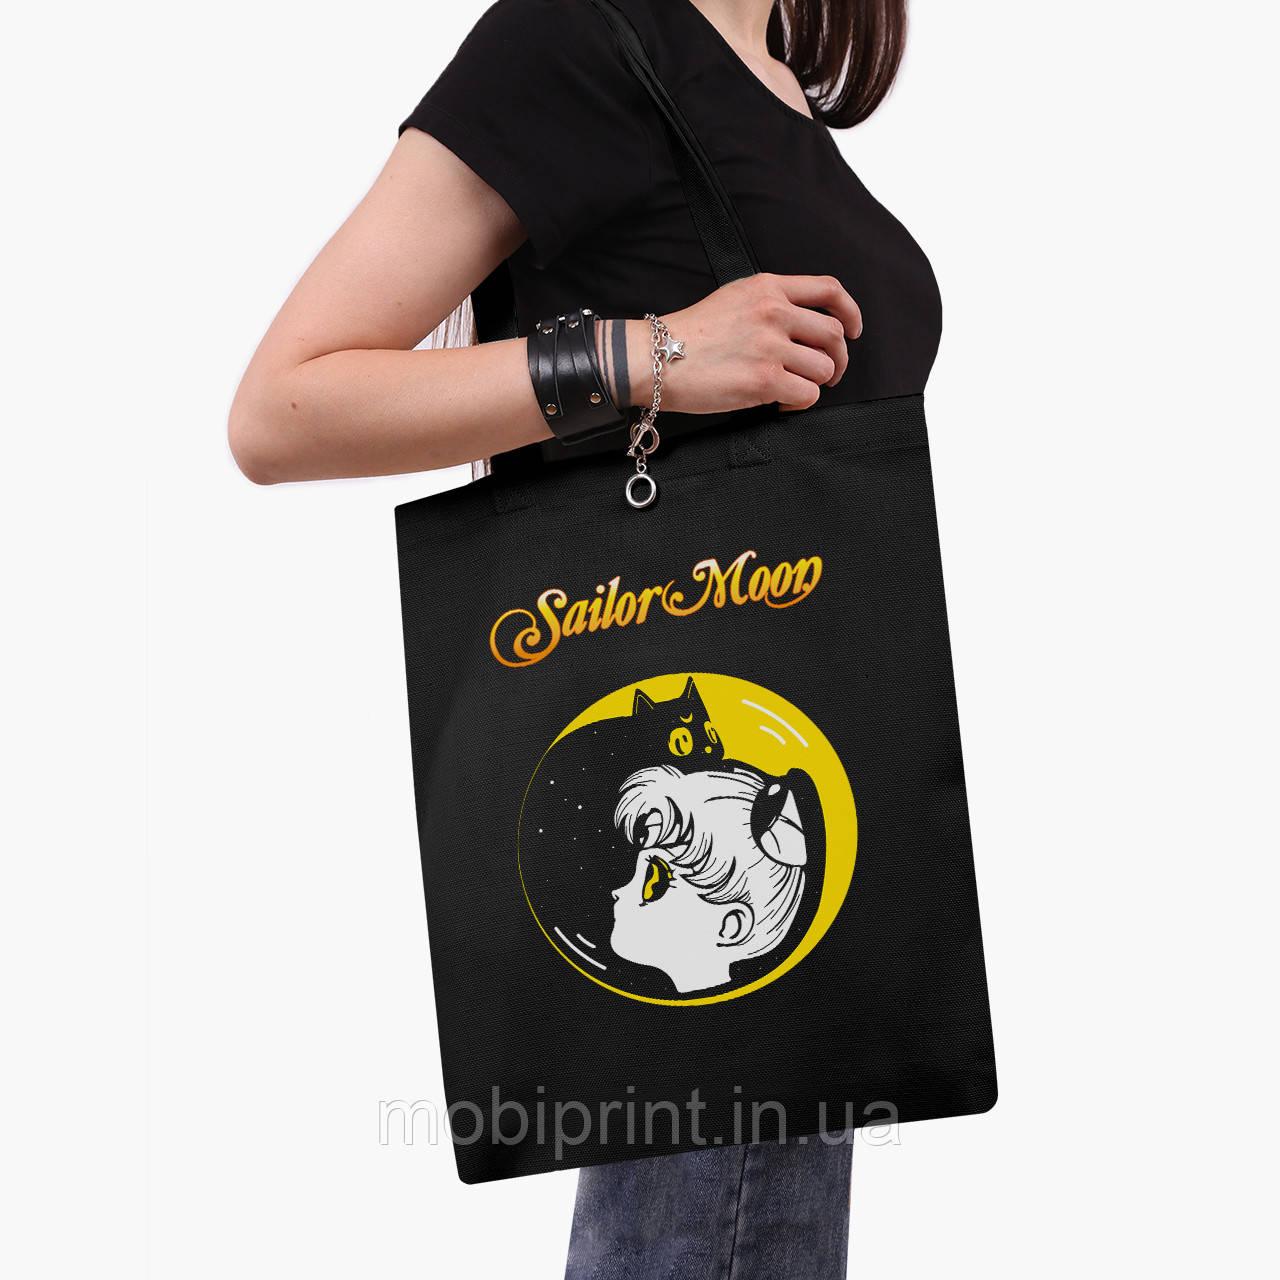 Эко сумка шоппер черная Сейлор Мун (Sailor Moon) (9227-2660-2)  41*35 см